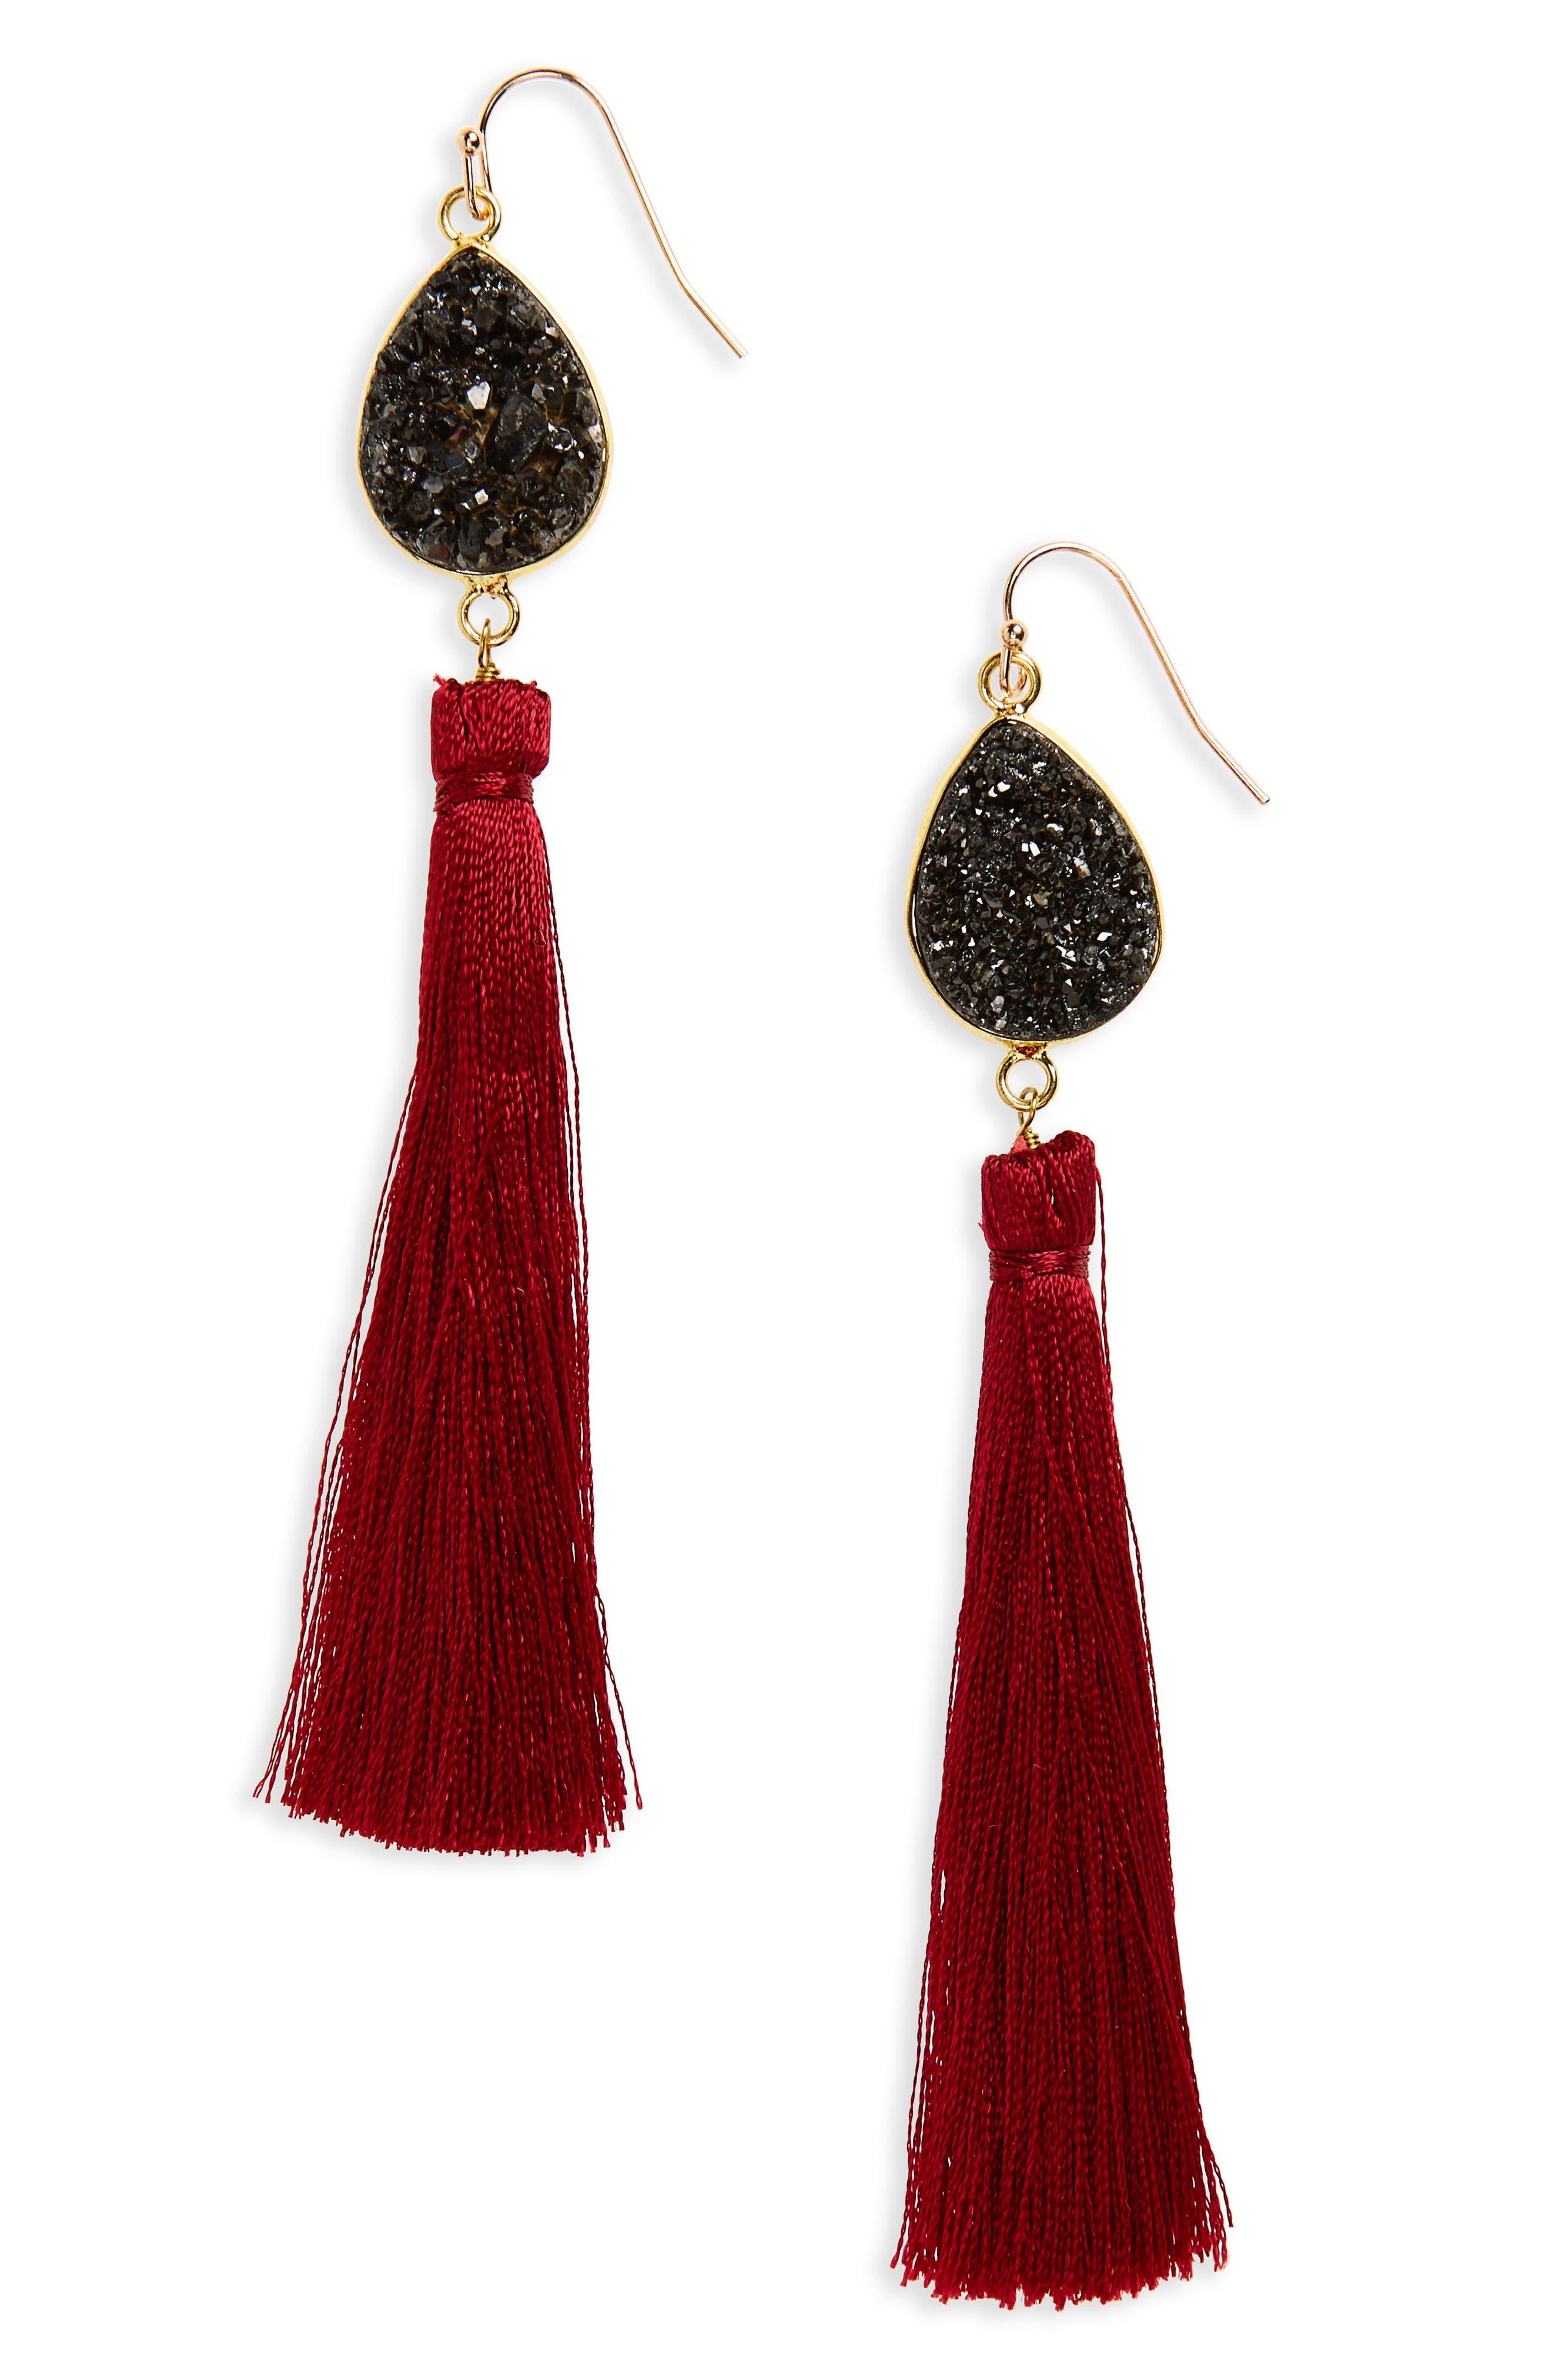 Drusy Tassel Earrings,                             Main thumbnail 1, color,                             930